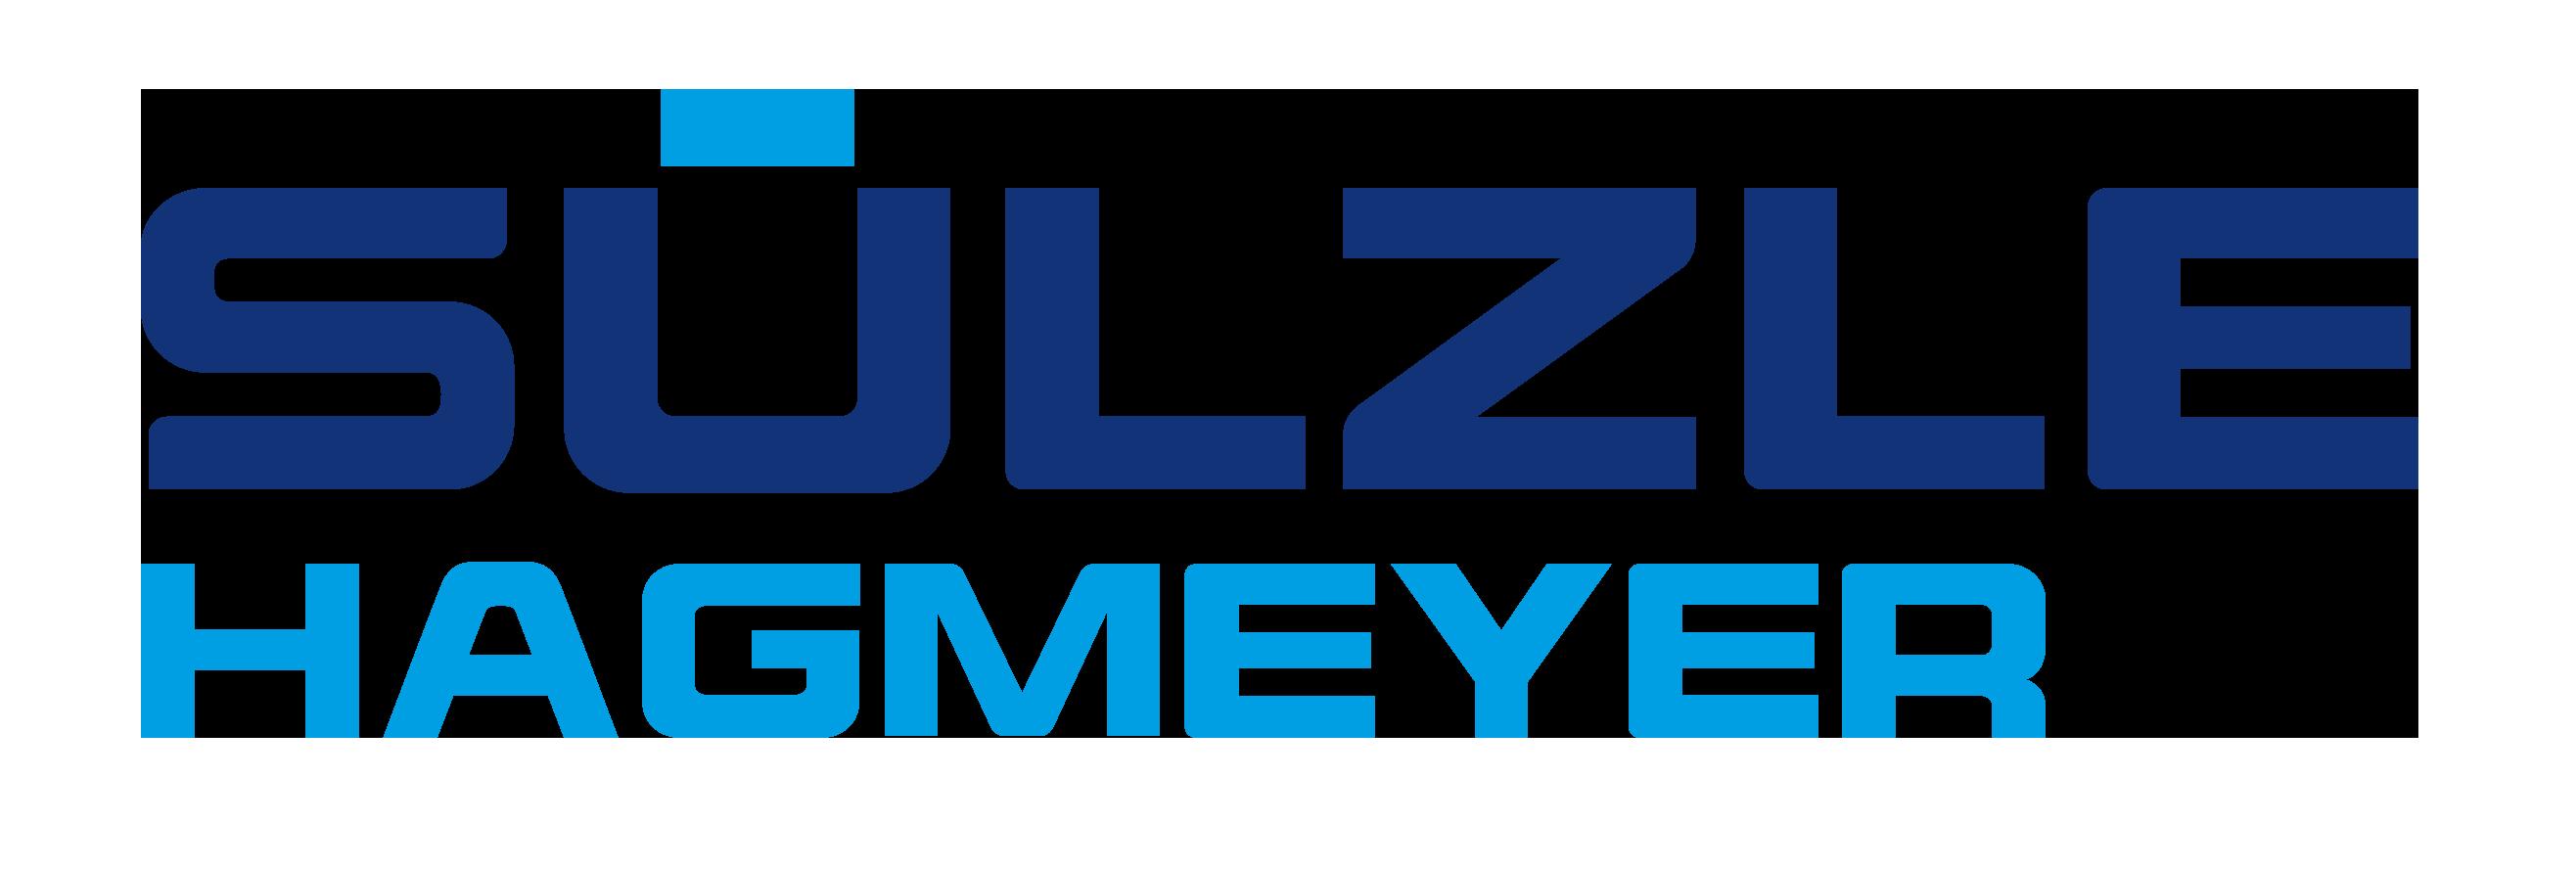 Suelzle Logo HAGMEYER